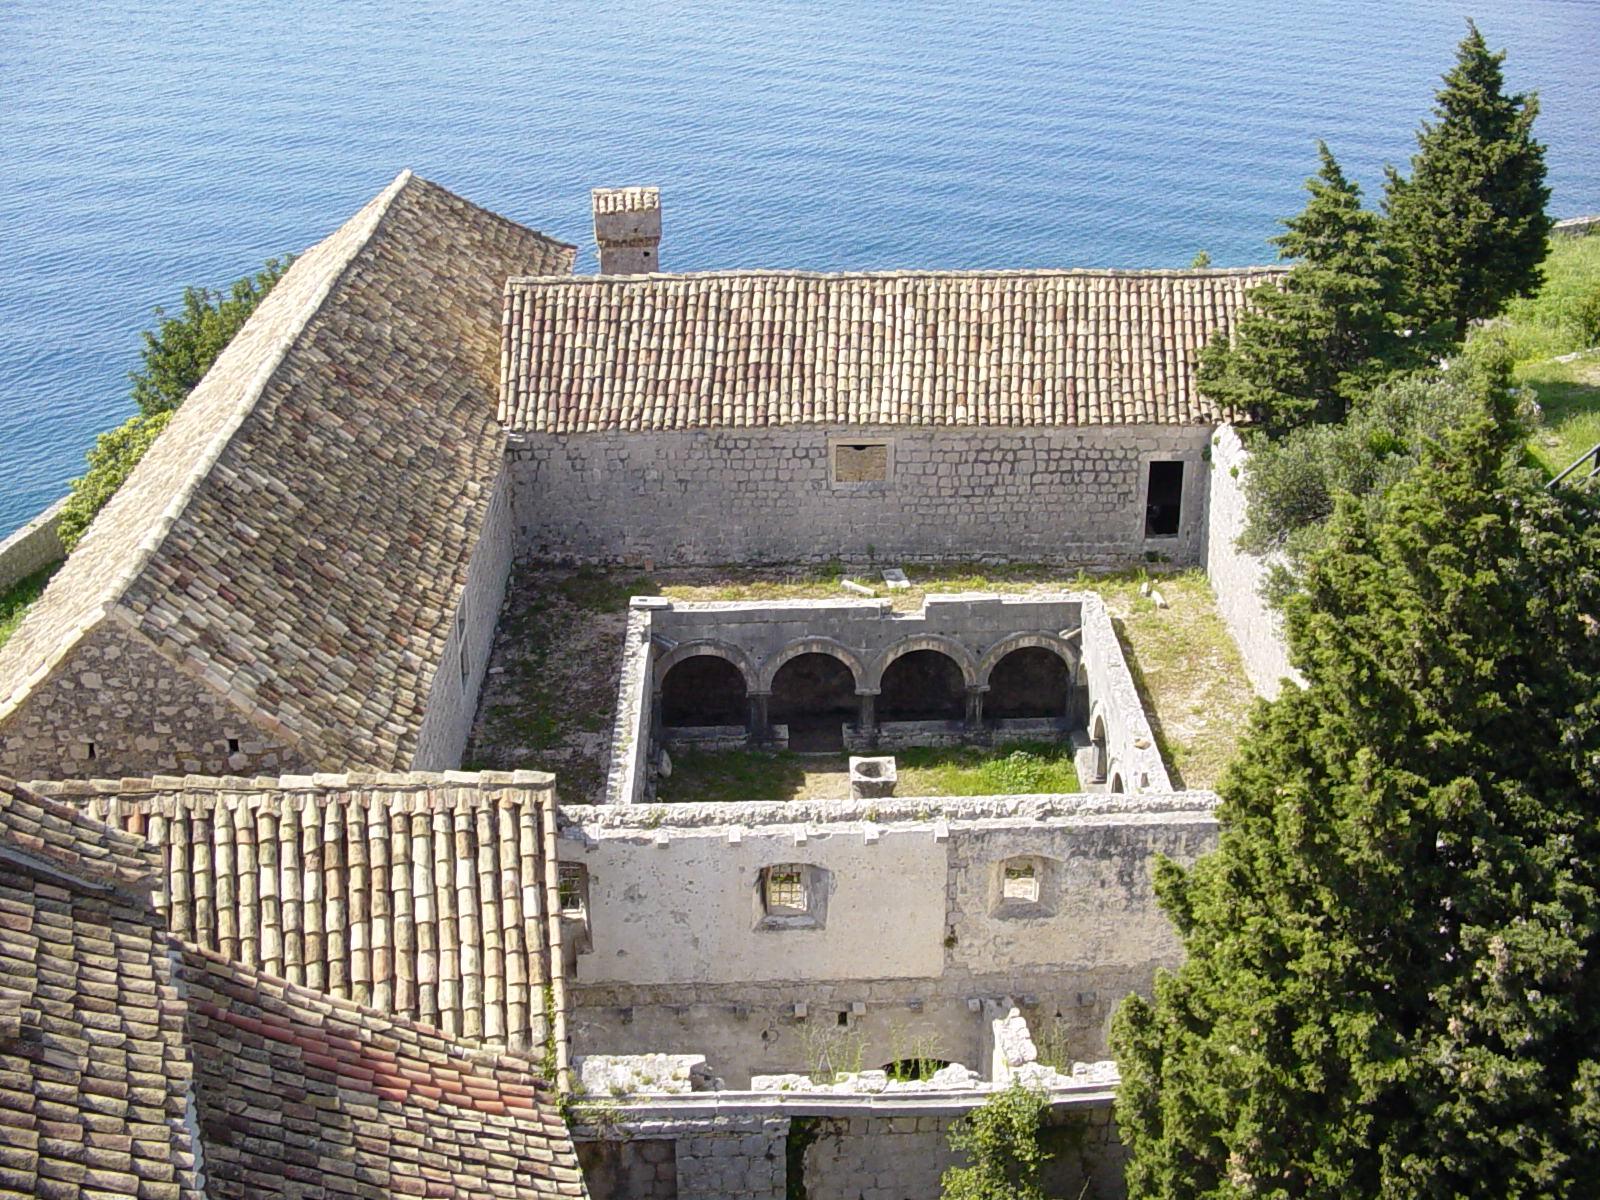 Pre-conservation, Cloister, Lopud Island, Croatia